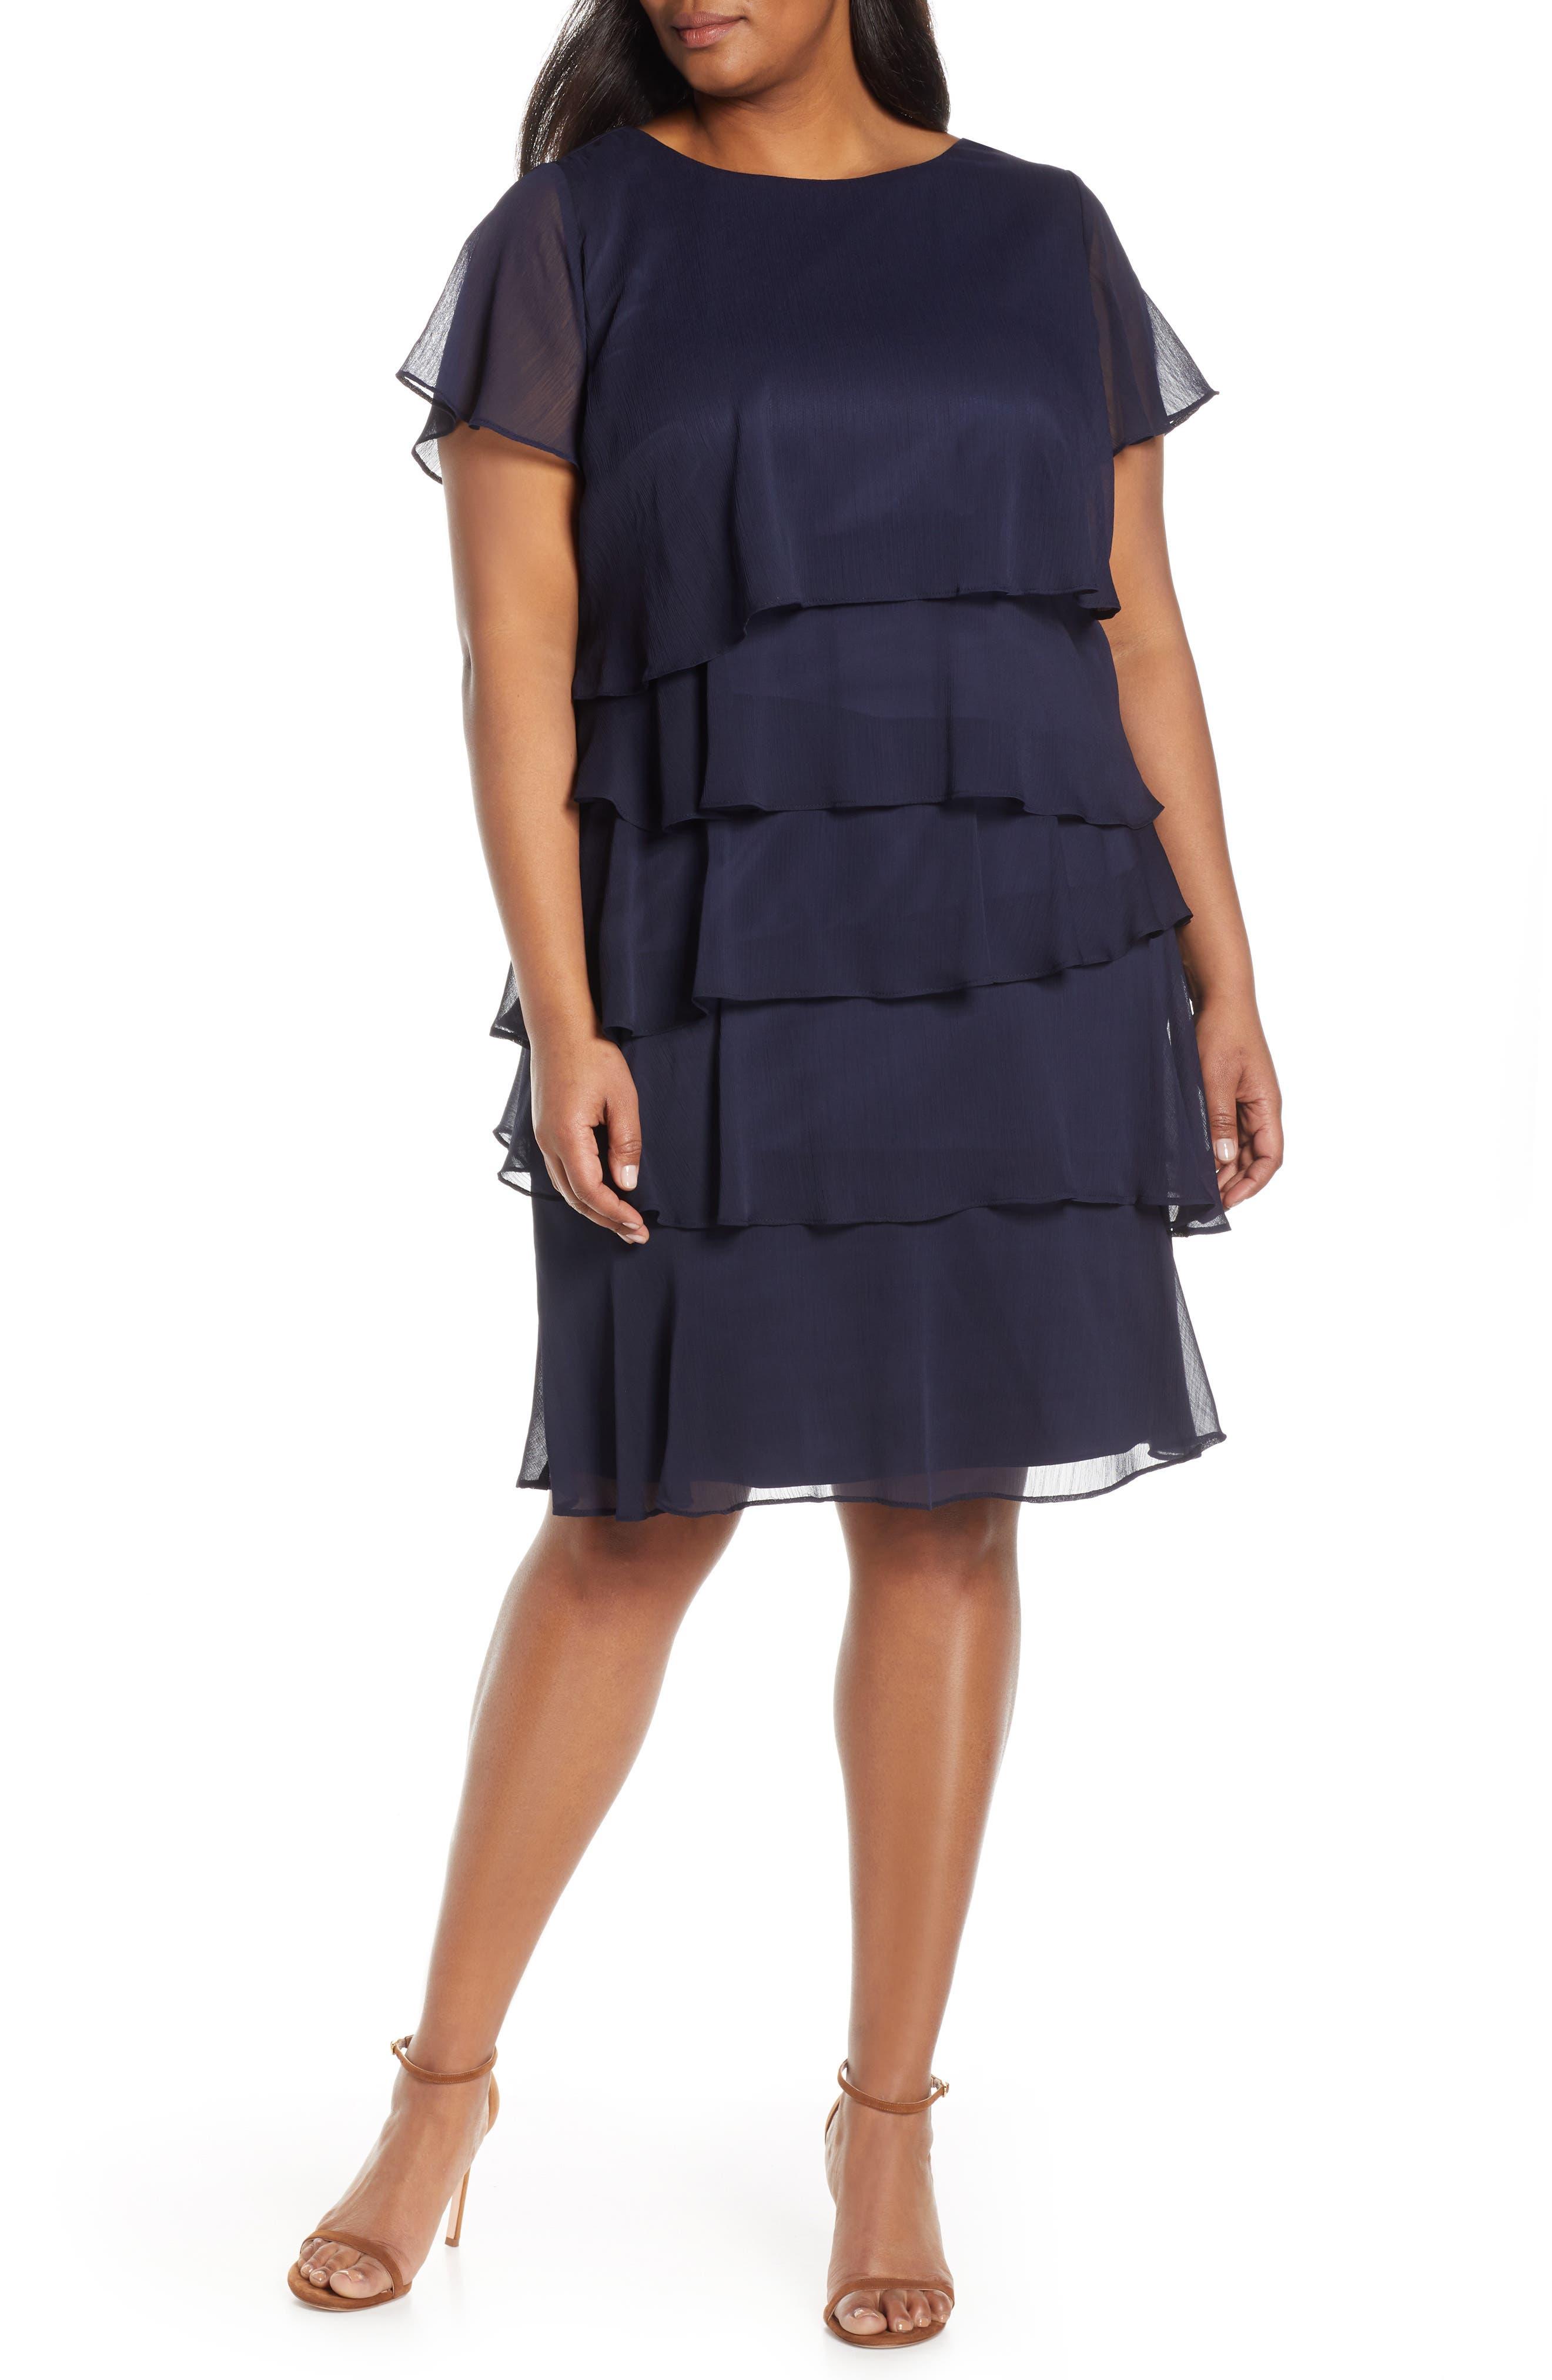 Vintage 1920s Dresses – Where to Buy Plus Size Womens Tahari Tiered Ruffle Chiffon Shift Dress $148.00 AT vintagedancer.com